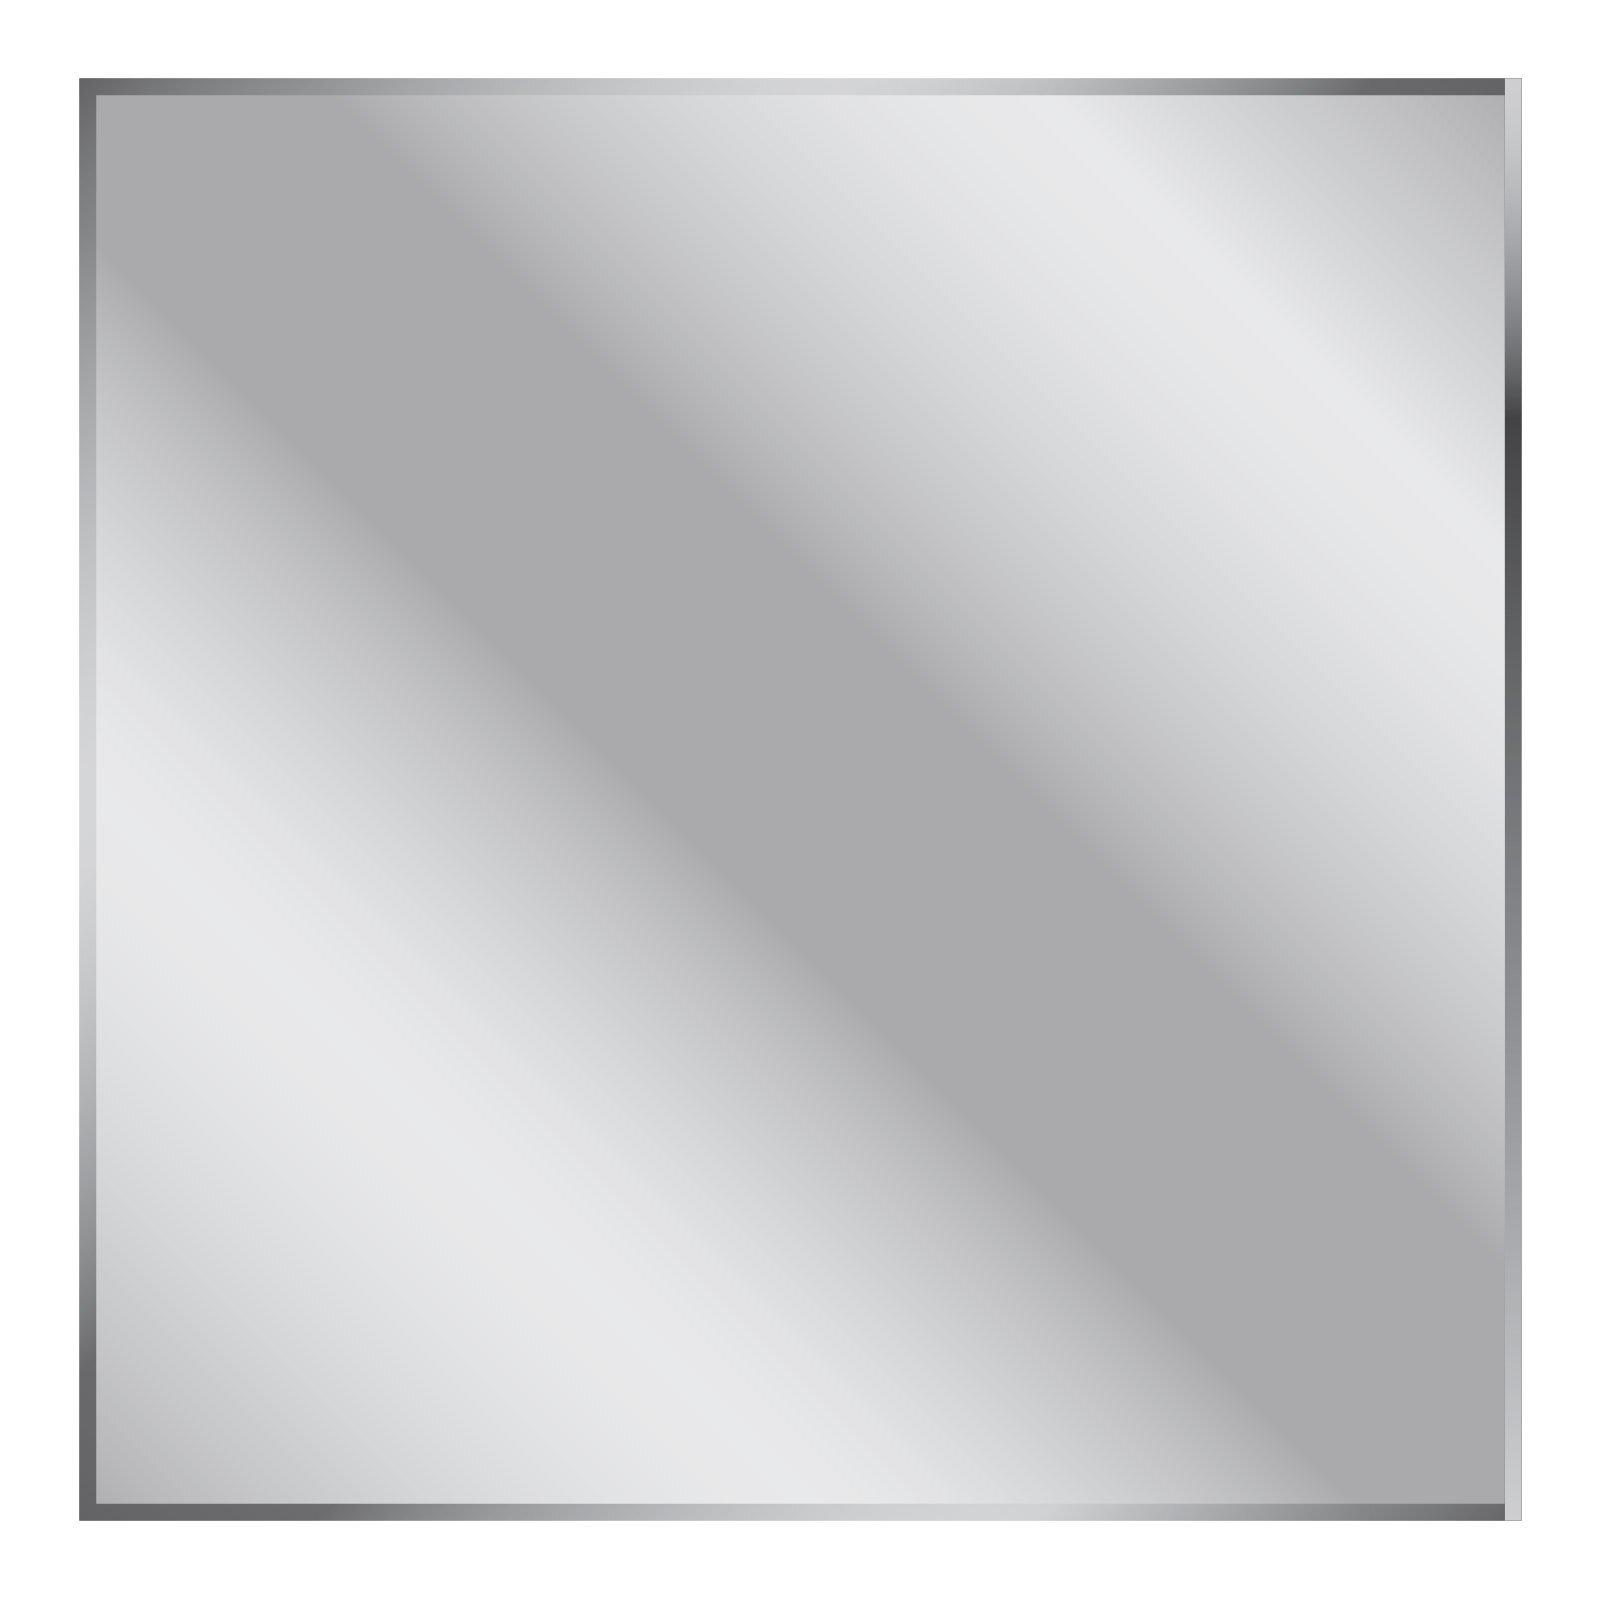 Living Elements 900 x 900 x 5mm Bevel Edge Mirror